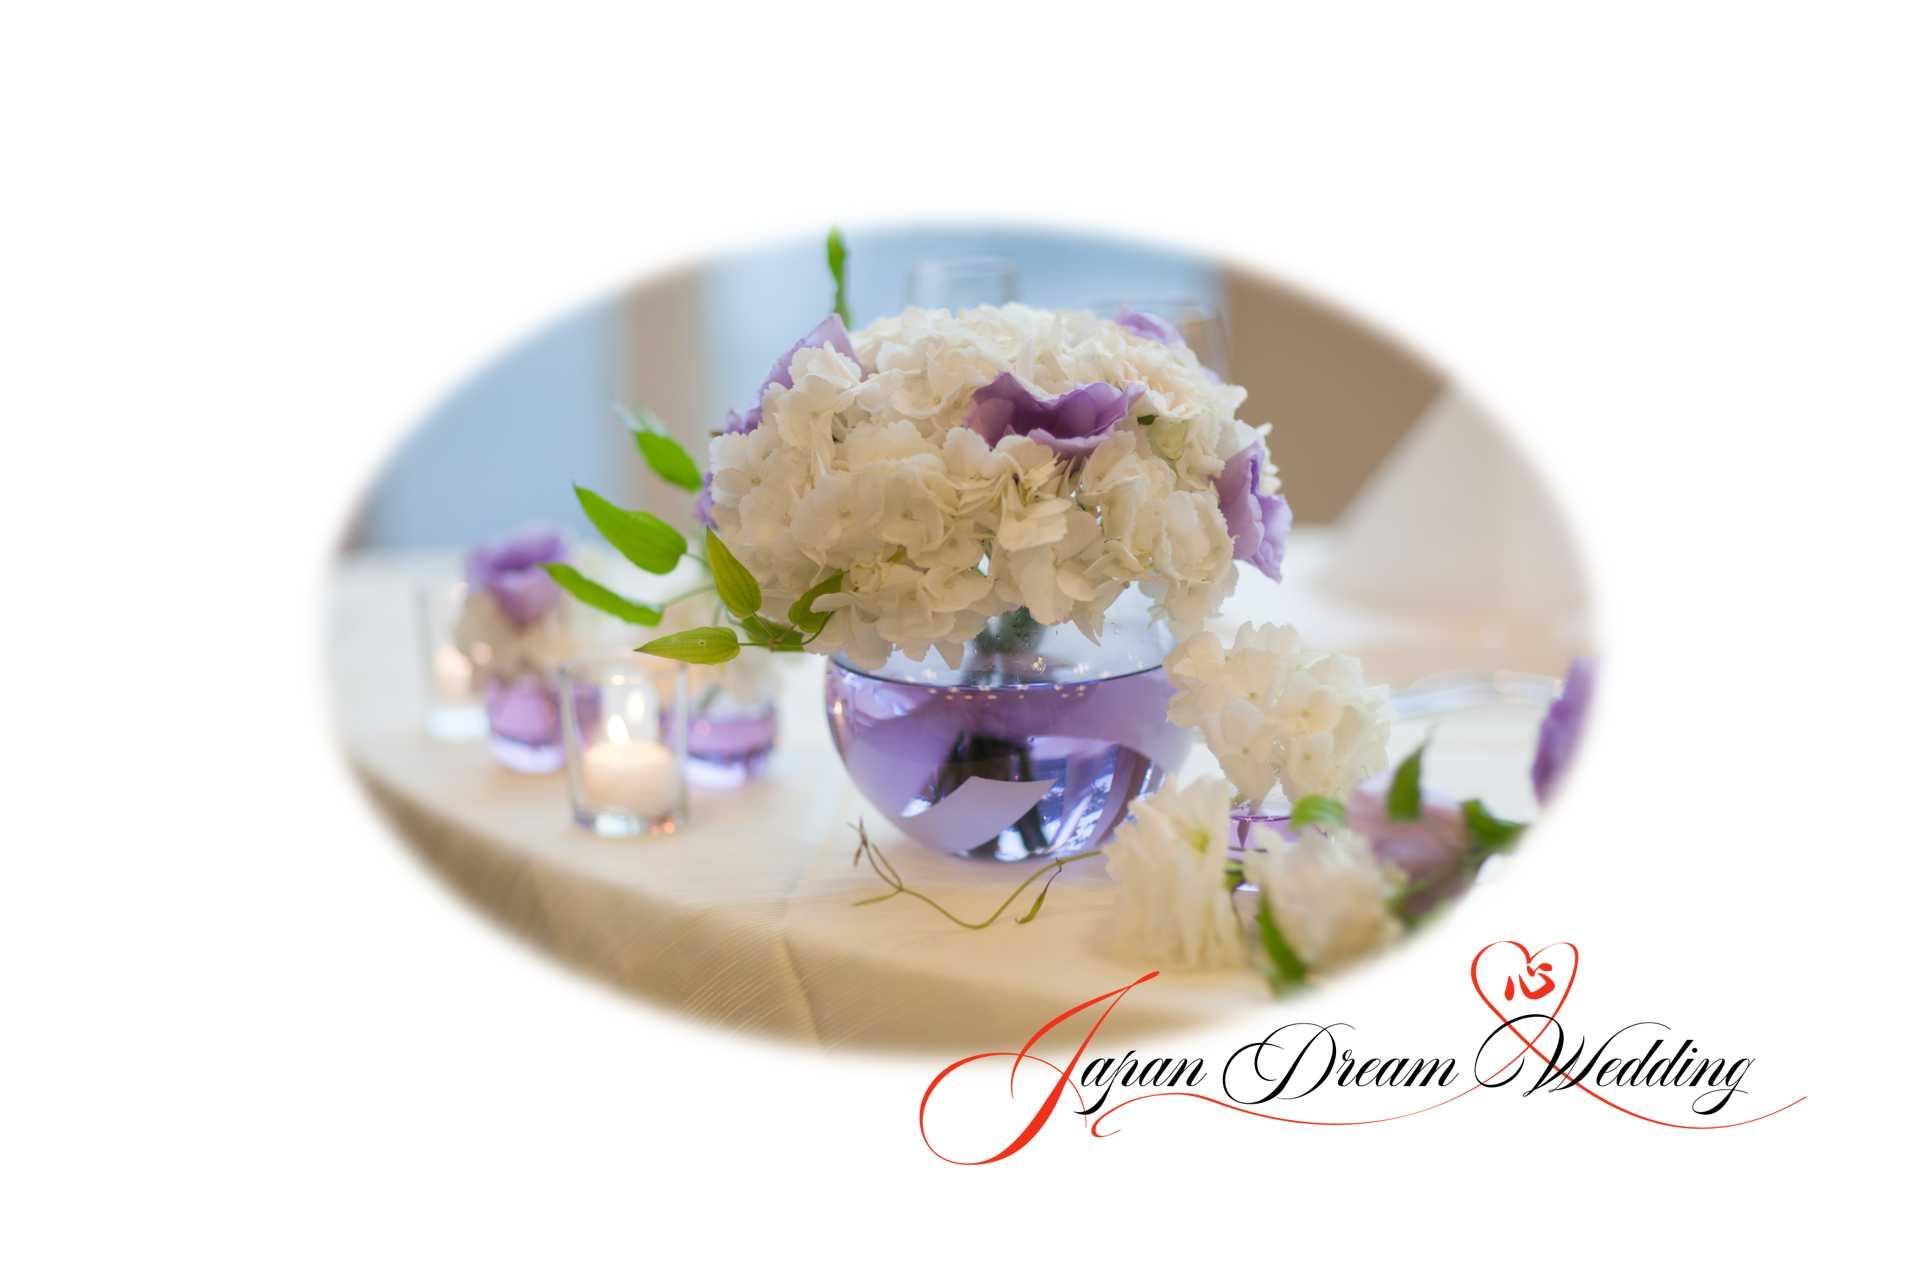 Japan Dream Wedding Flower Arrangement Services